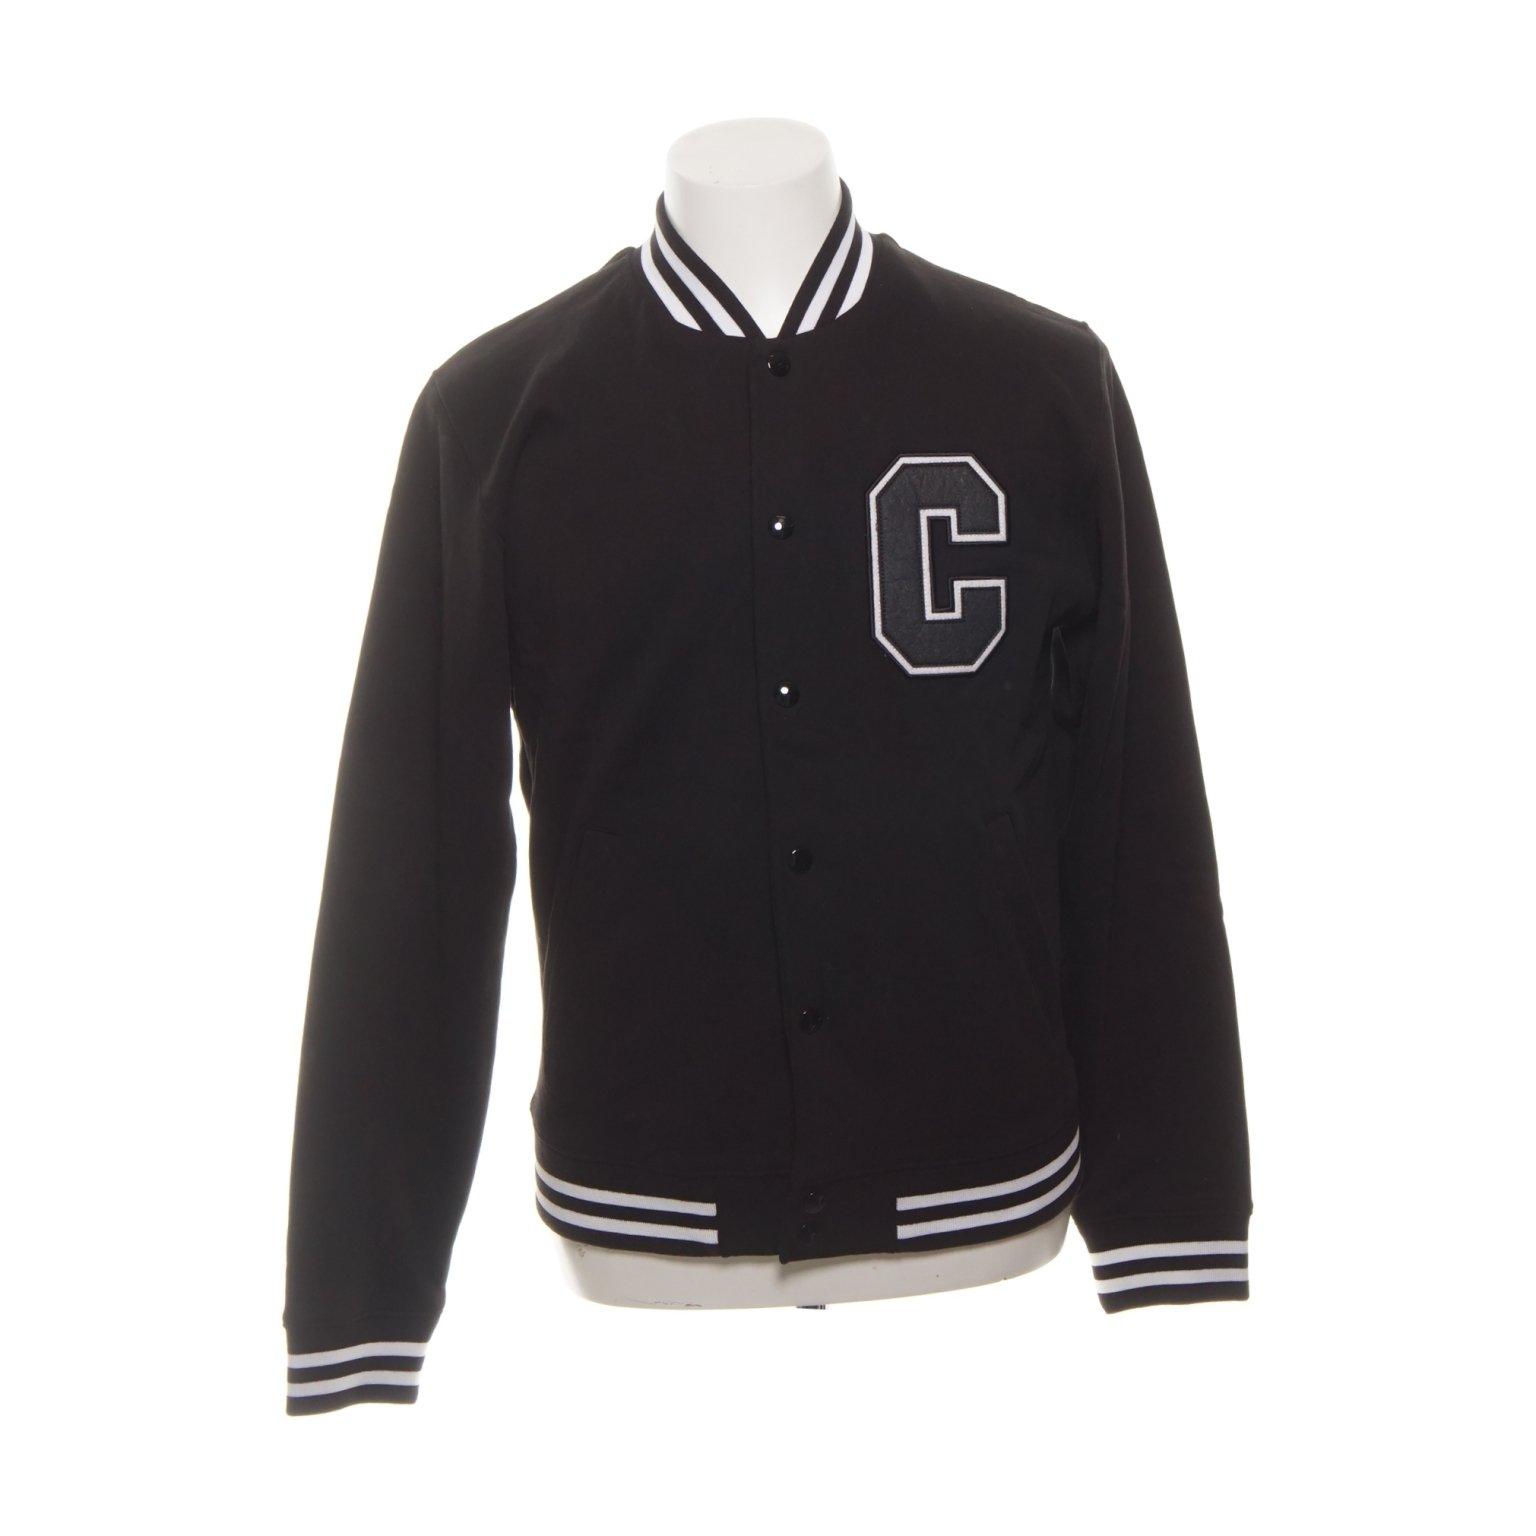 Rugged Outdoor Wear Carhartt Kofta Strl 367619644 ᐈ Sellpy Pa Tradera